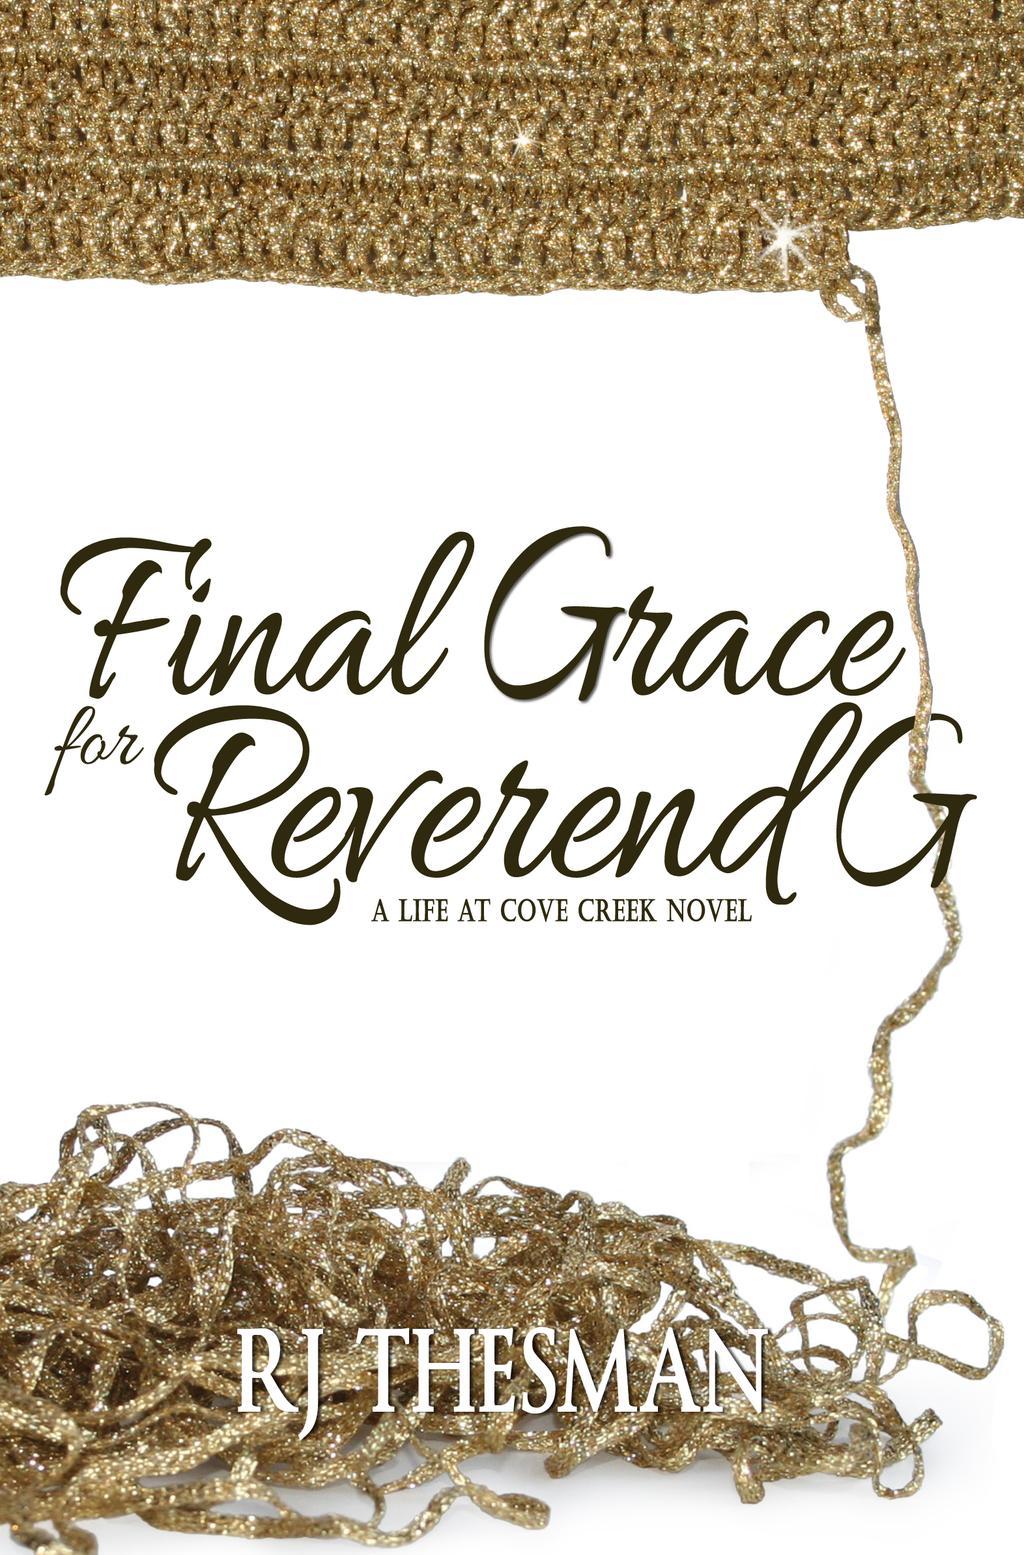 Rev G 3 Cover